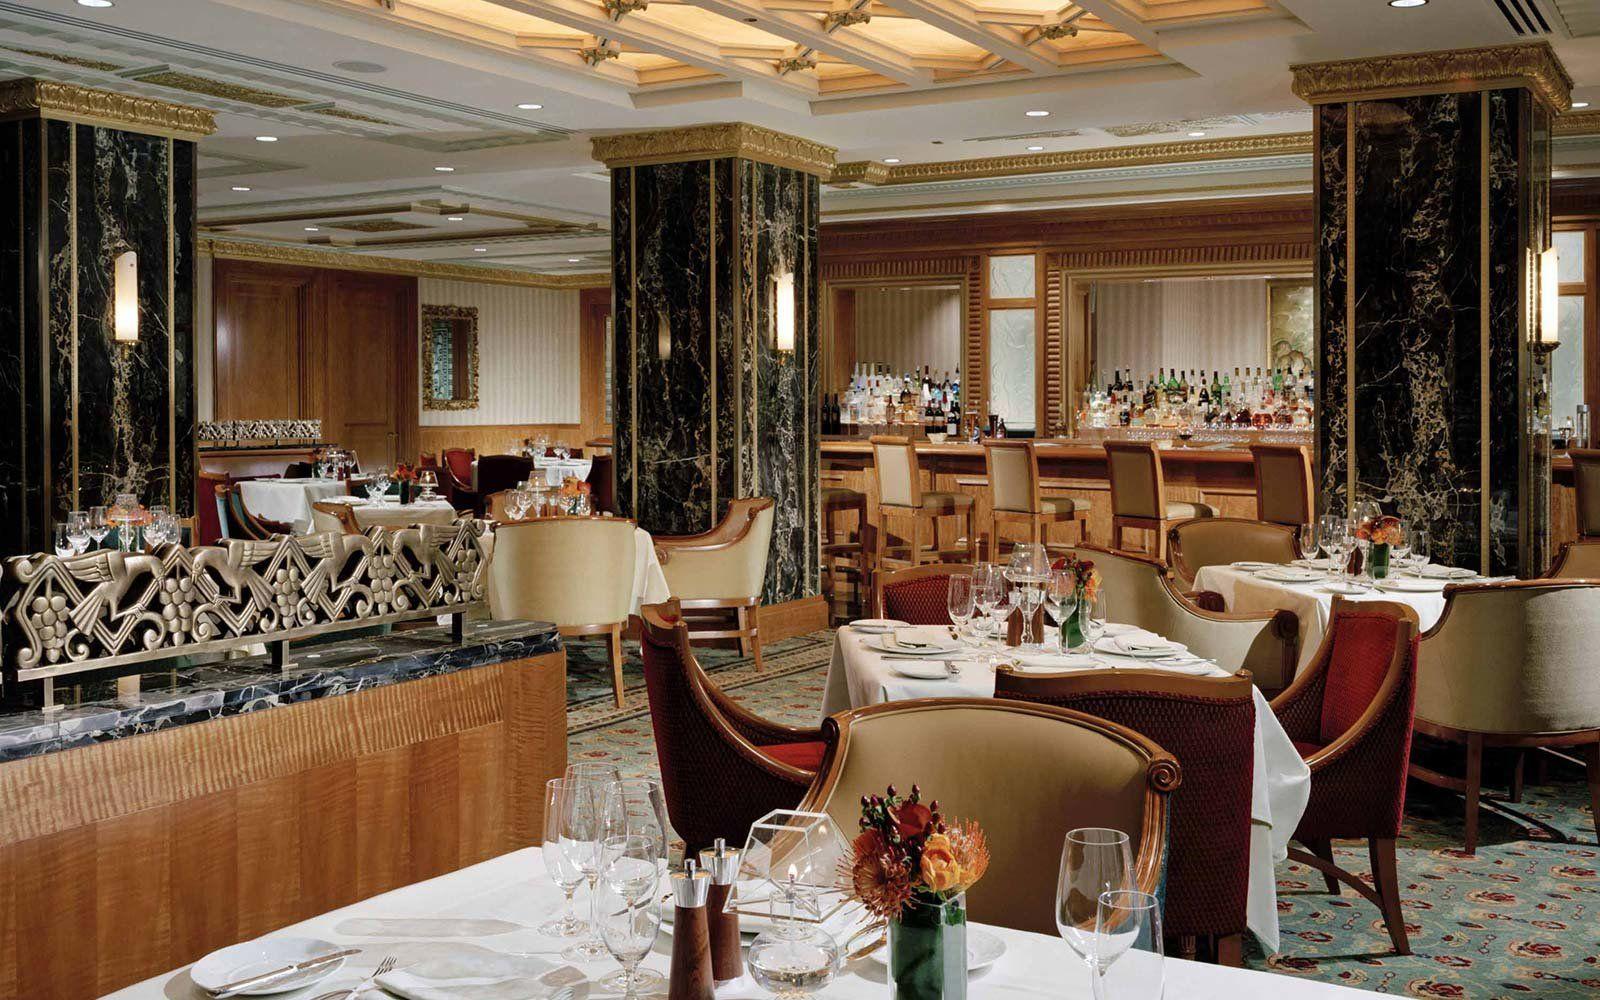 12 Of The World S Most Iconic Hotel Bars Hotel Bar Waldorf Astoria Astoria New York